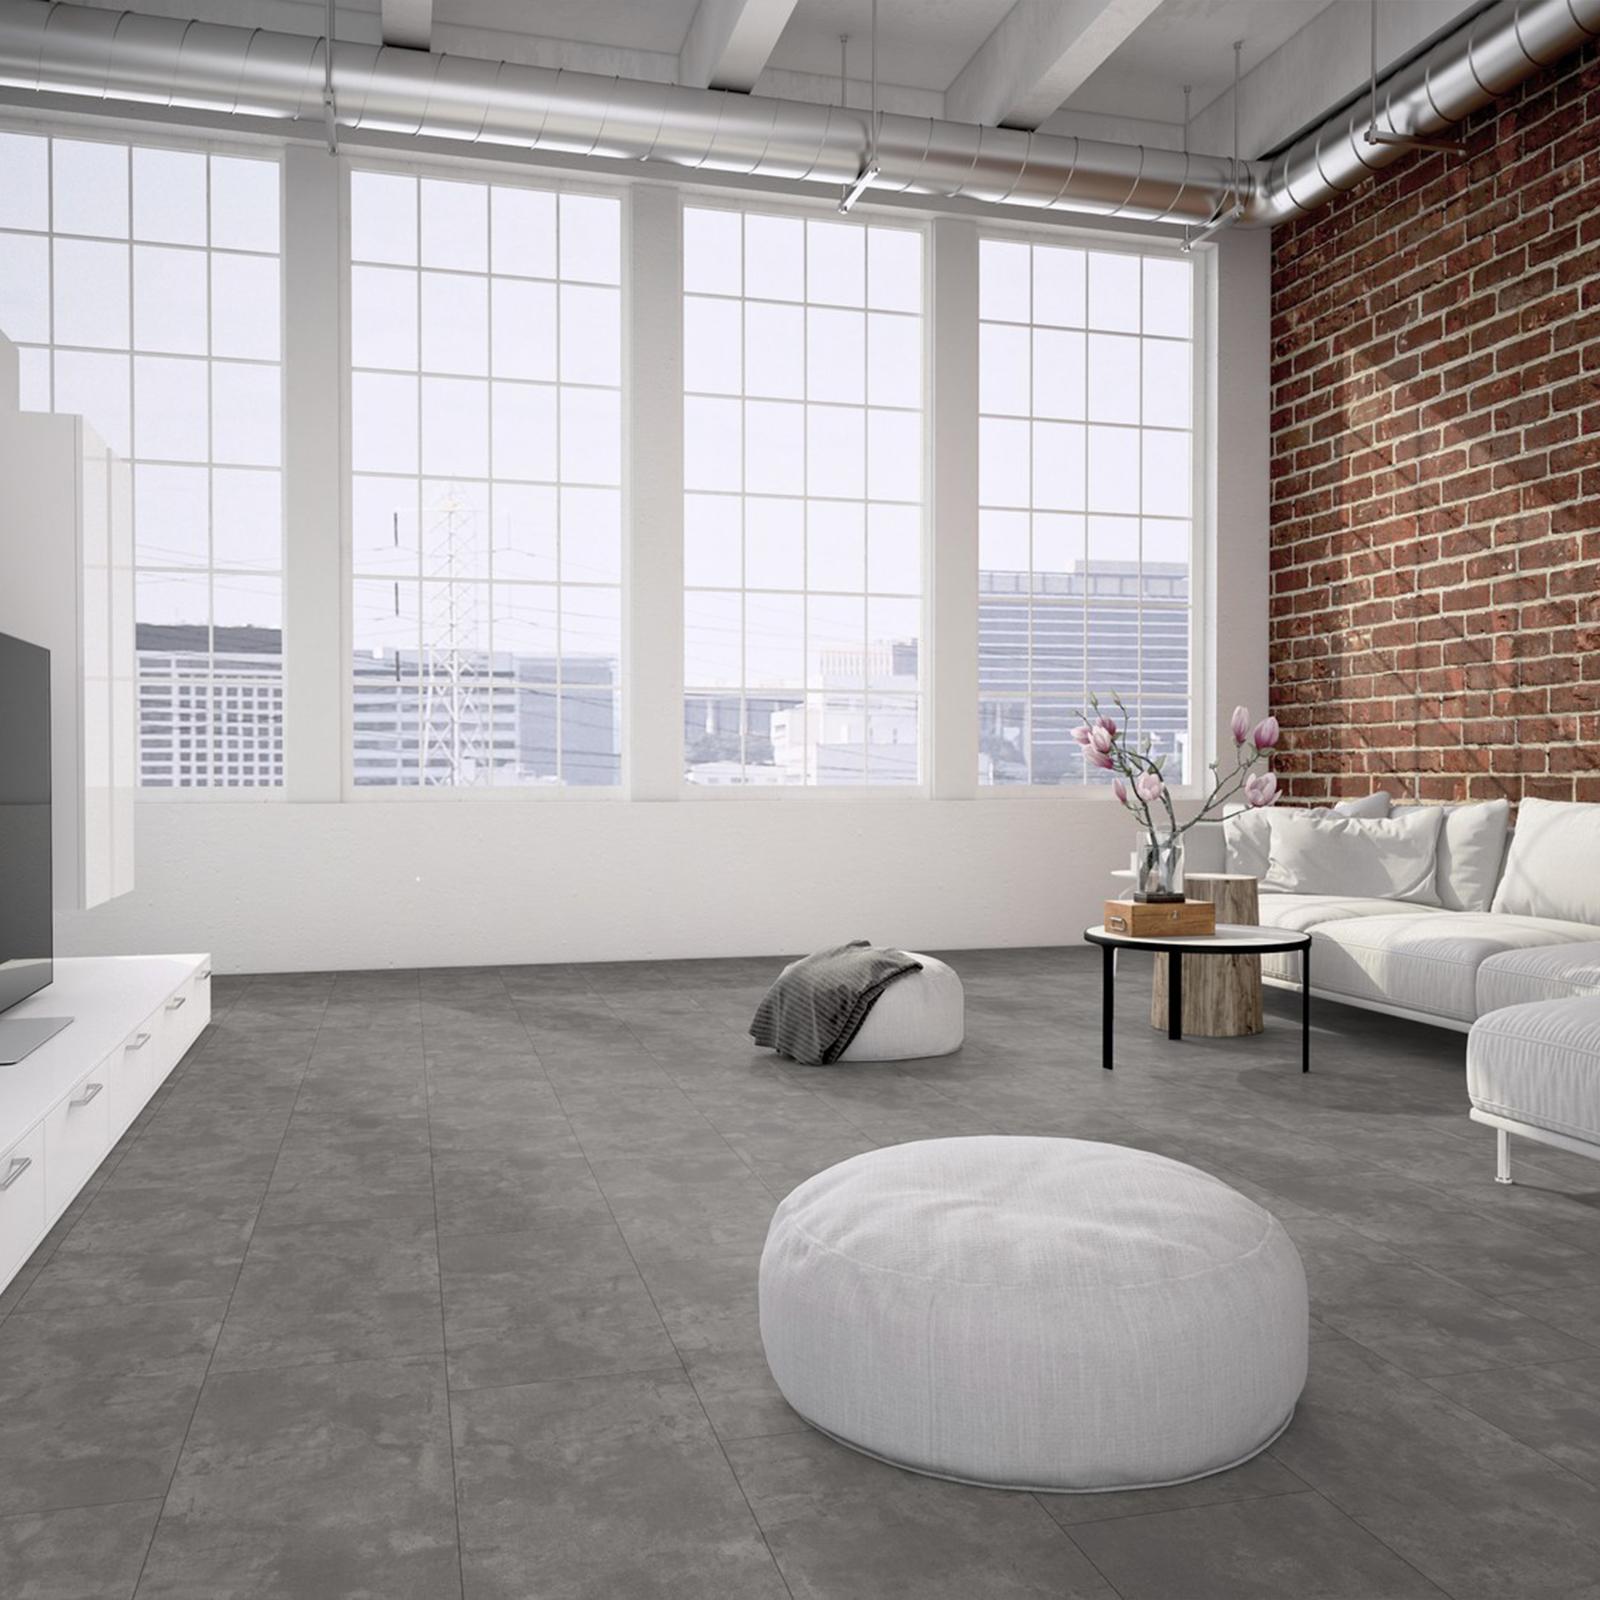 vinylboden pvc klick fliese bodenbelag steinoptik schiefer. Black Bedroom Furniture Sets. Home Design Ideas